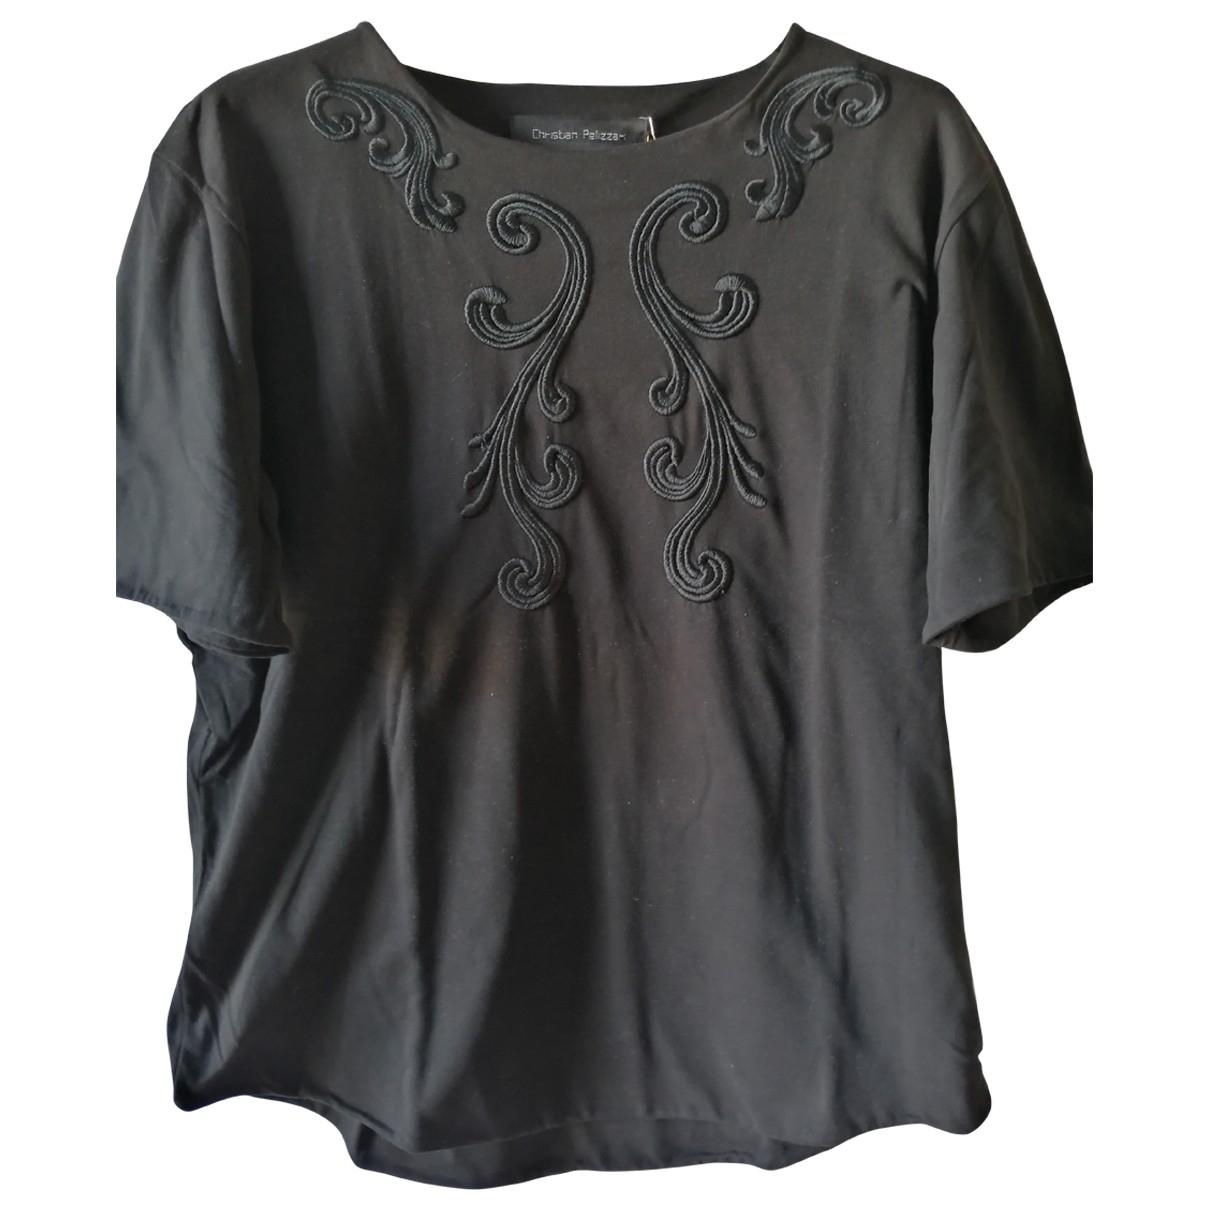 Christian Pellizzari \N T-Shirts in  Schwarz Baumwolle